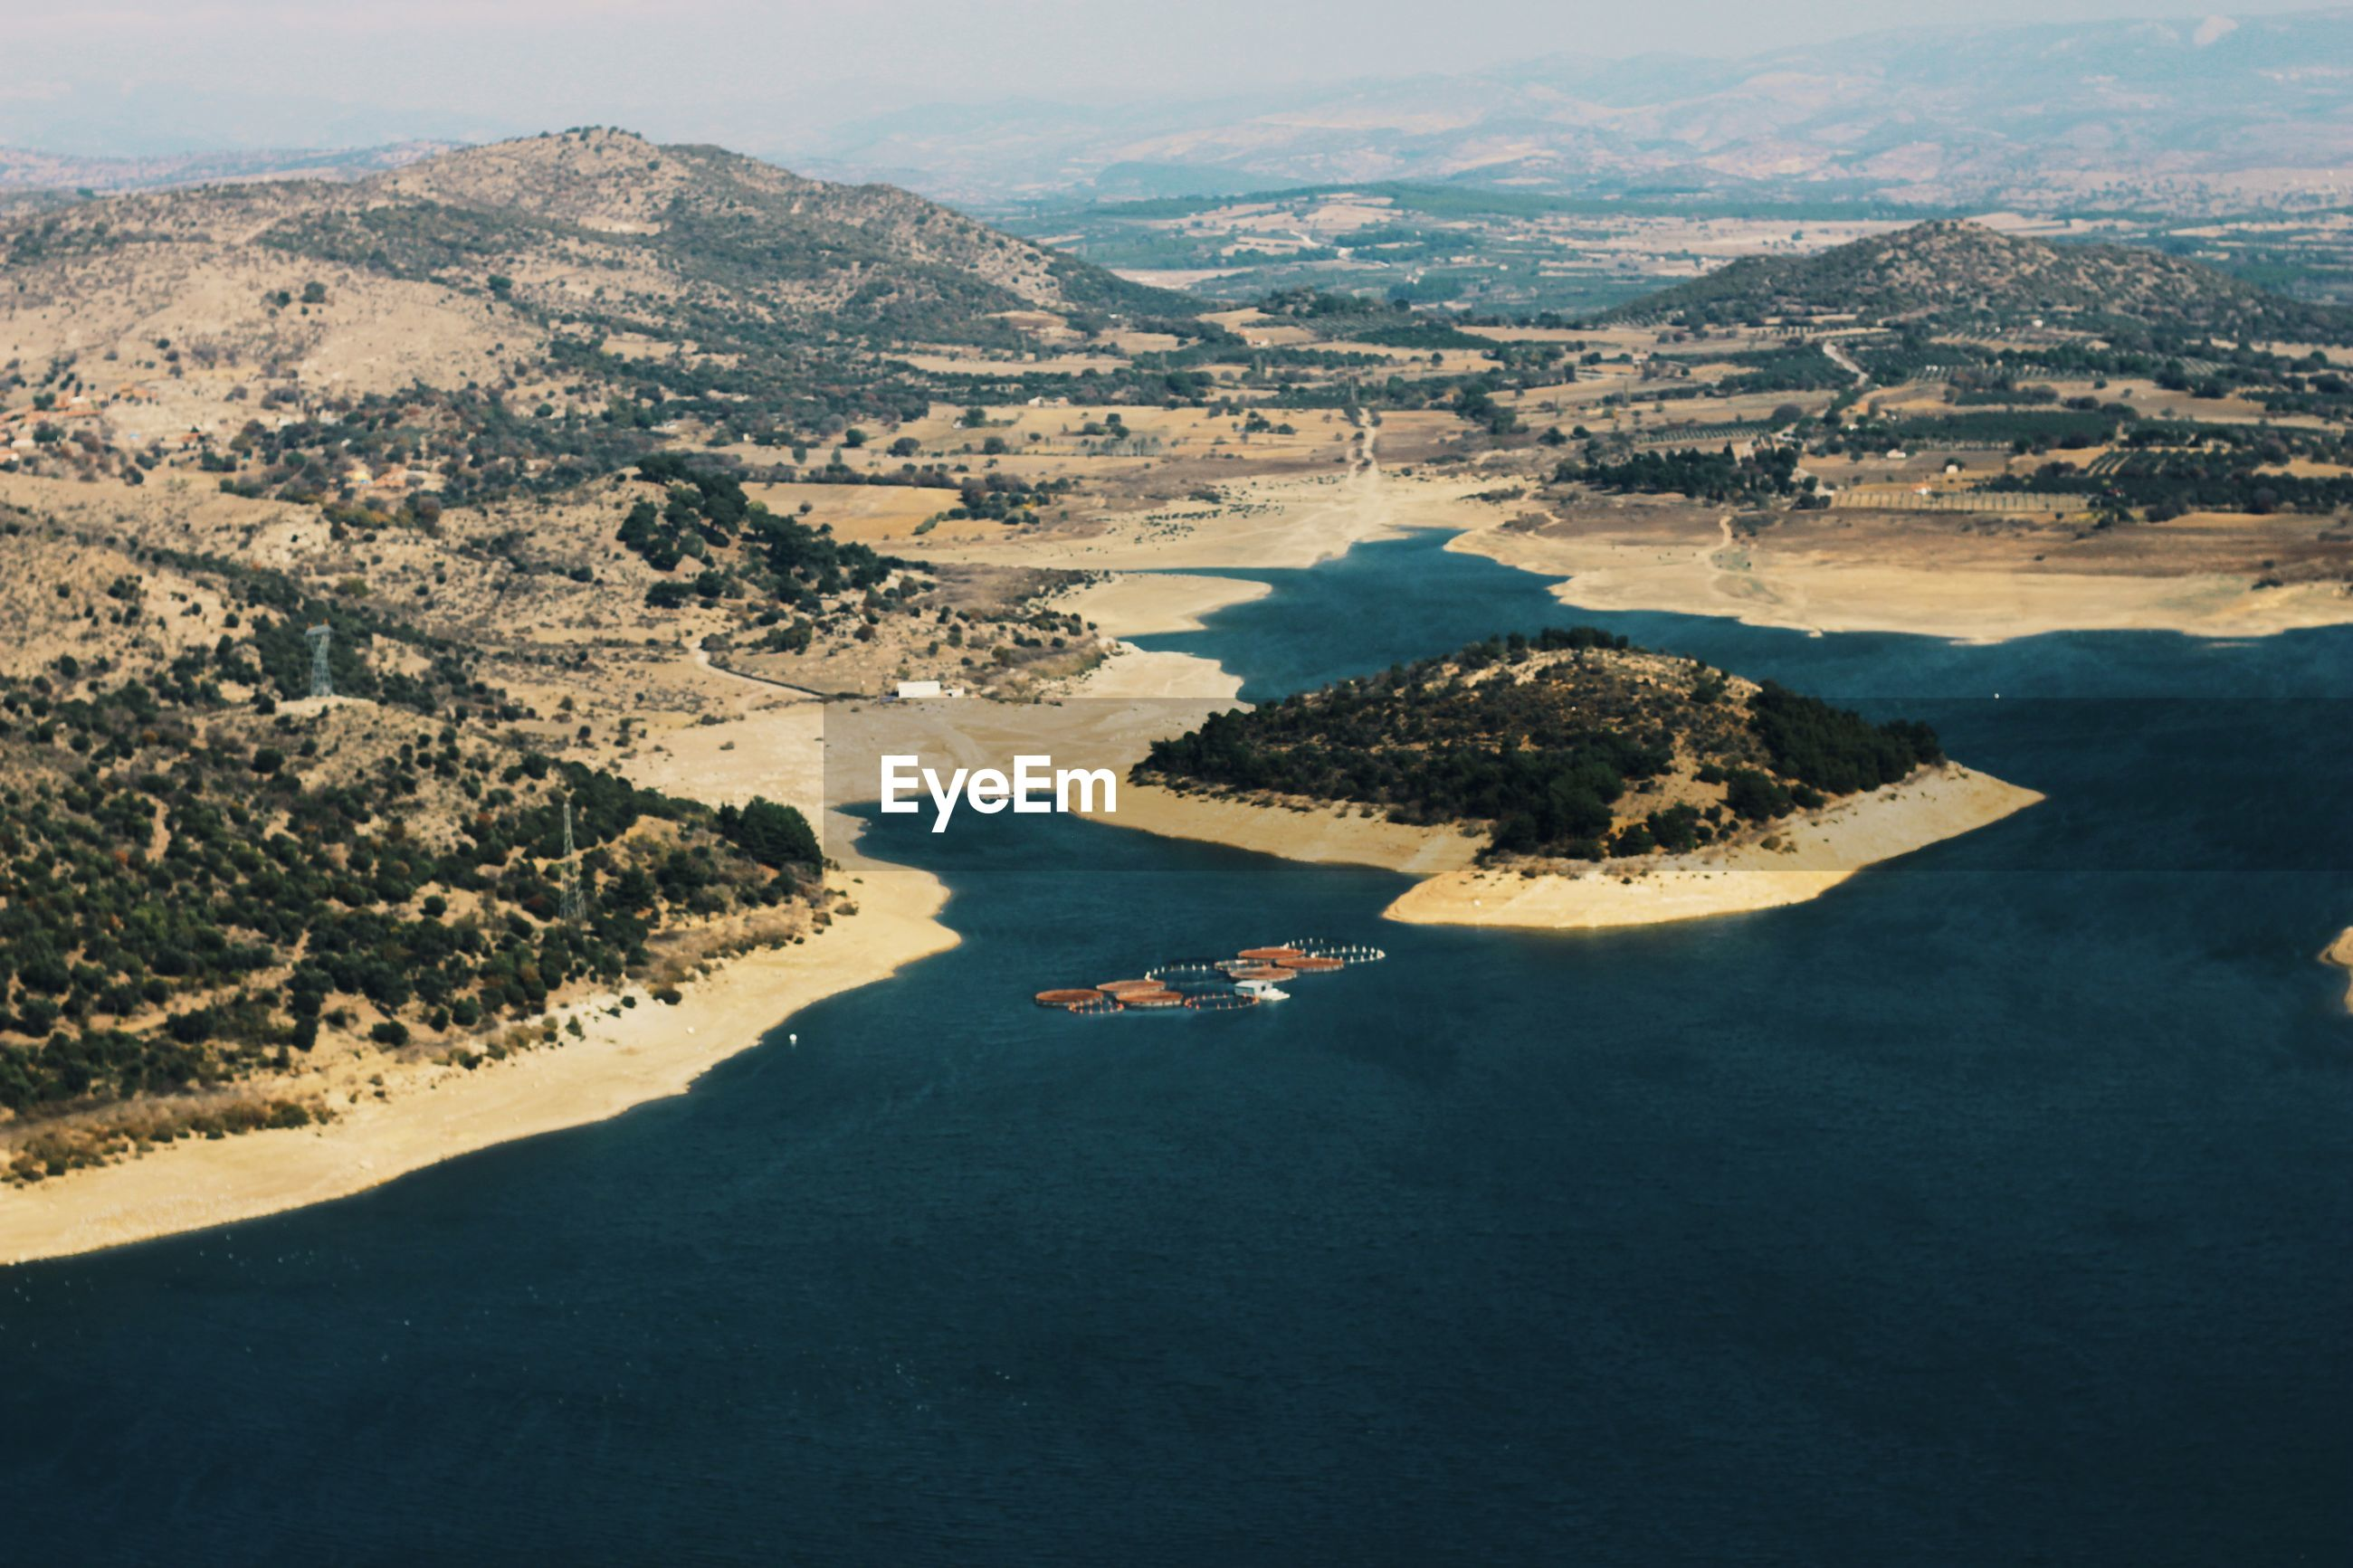 HIGH ANGLE VIEW OF SEA AND MOUNTAIN